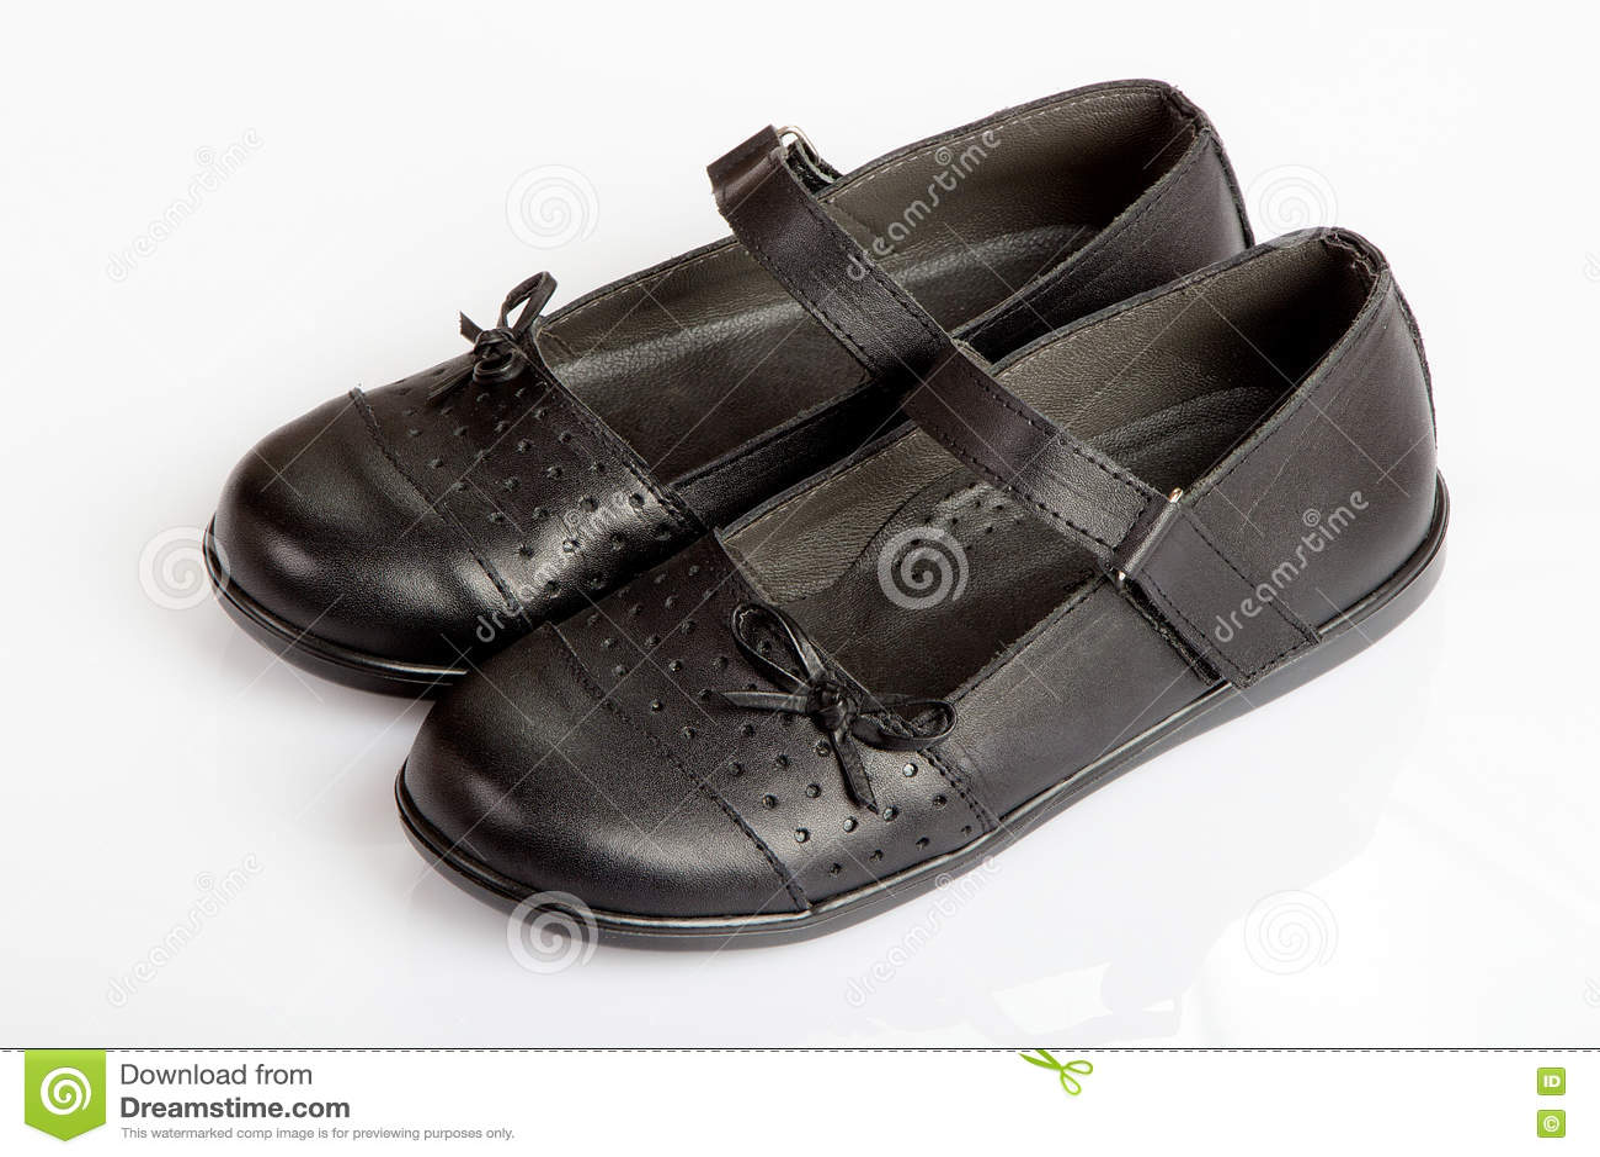 10,363 School Shoes Photos - Free